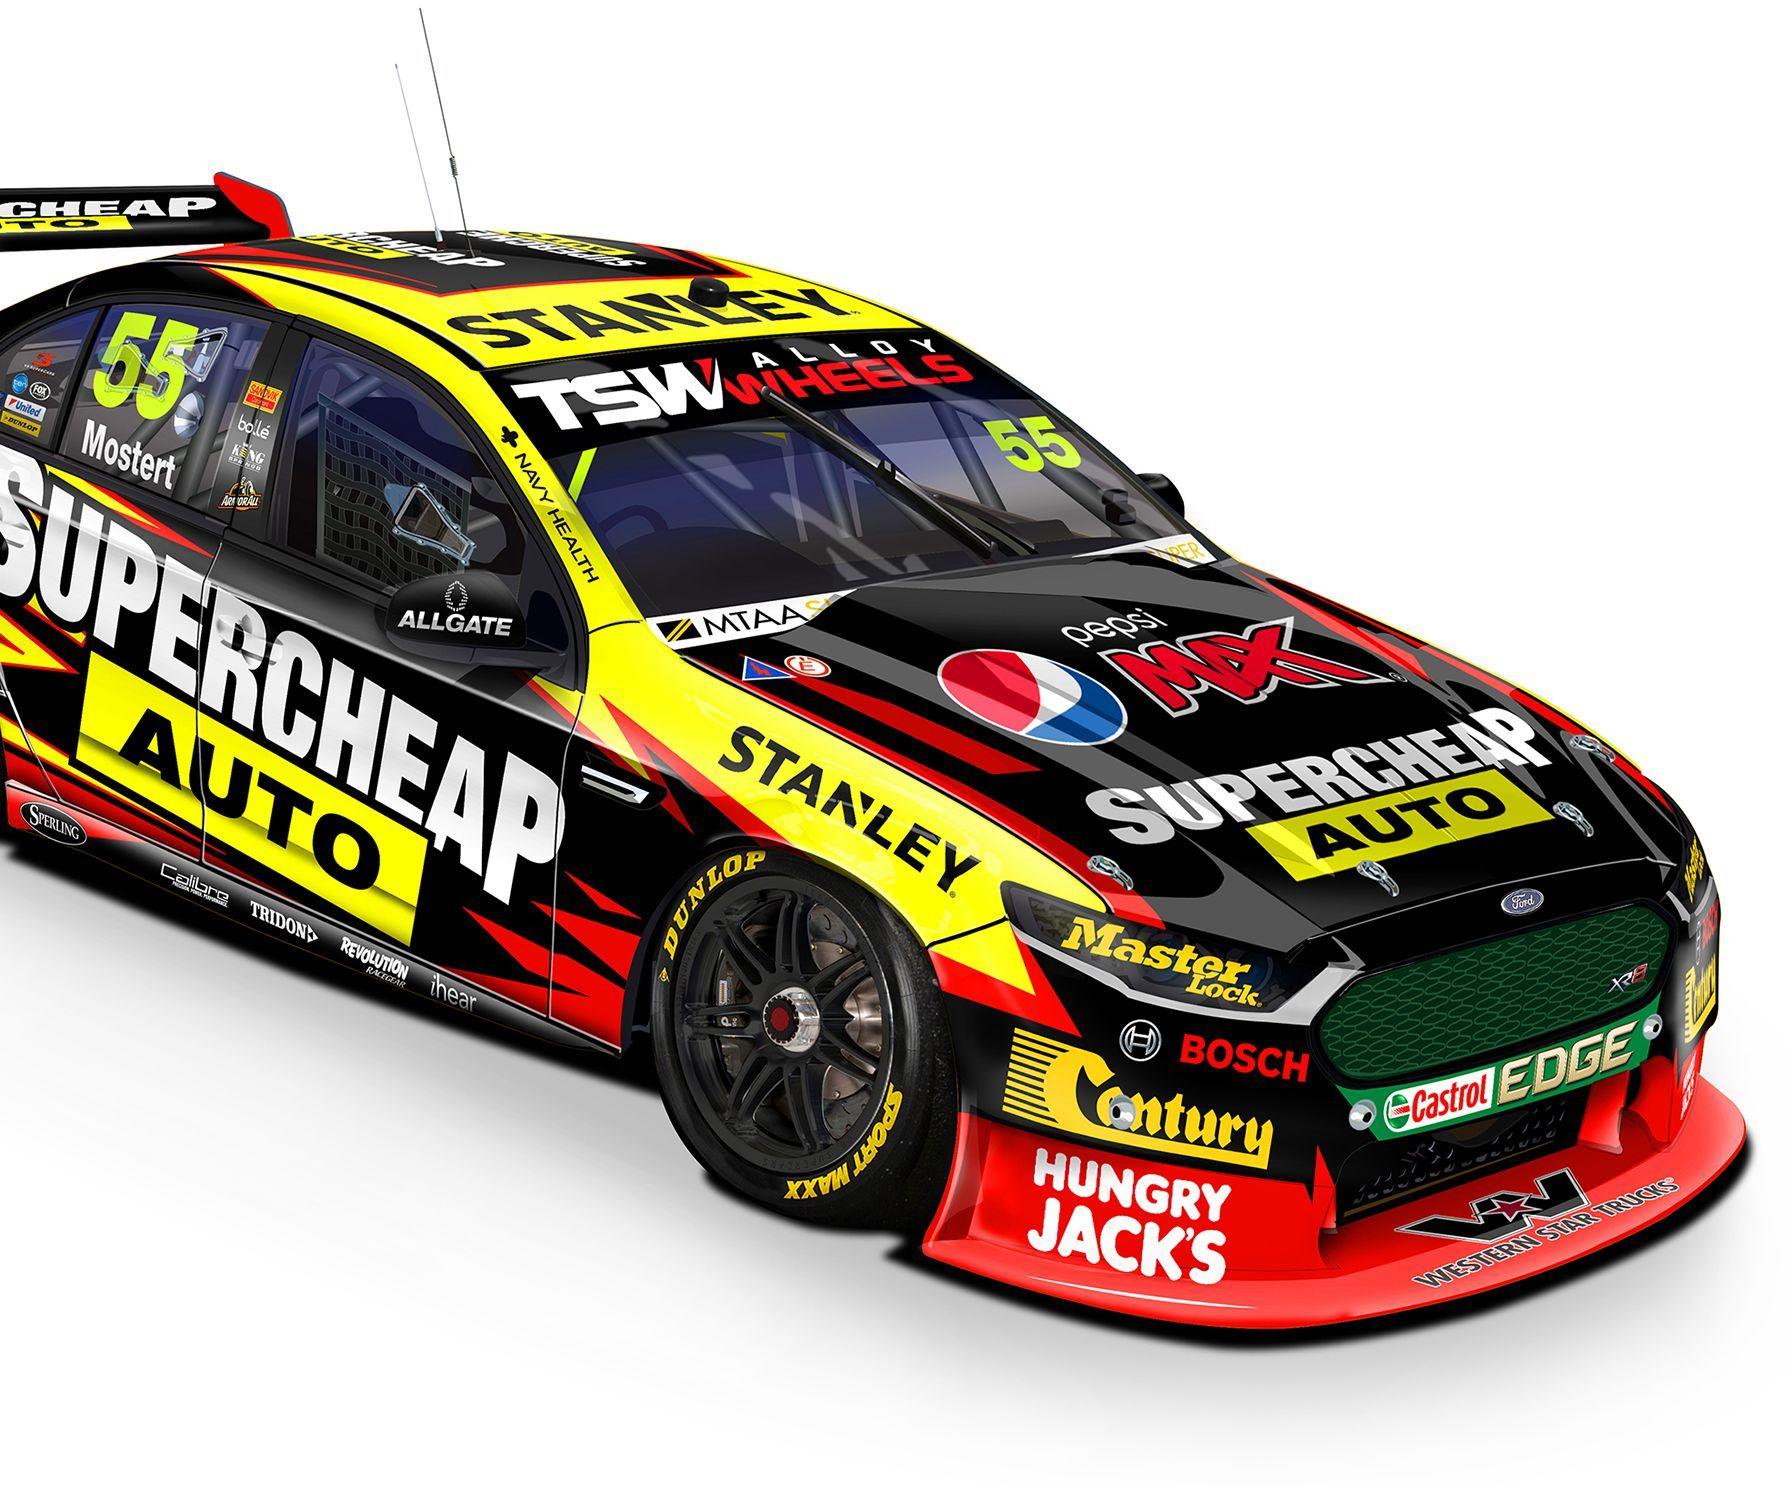 Supercheap Auto Racing V8 Supercars Super Cars Racing Race Cars